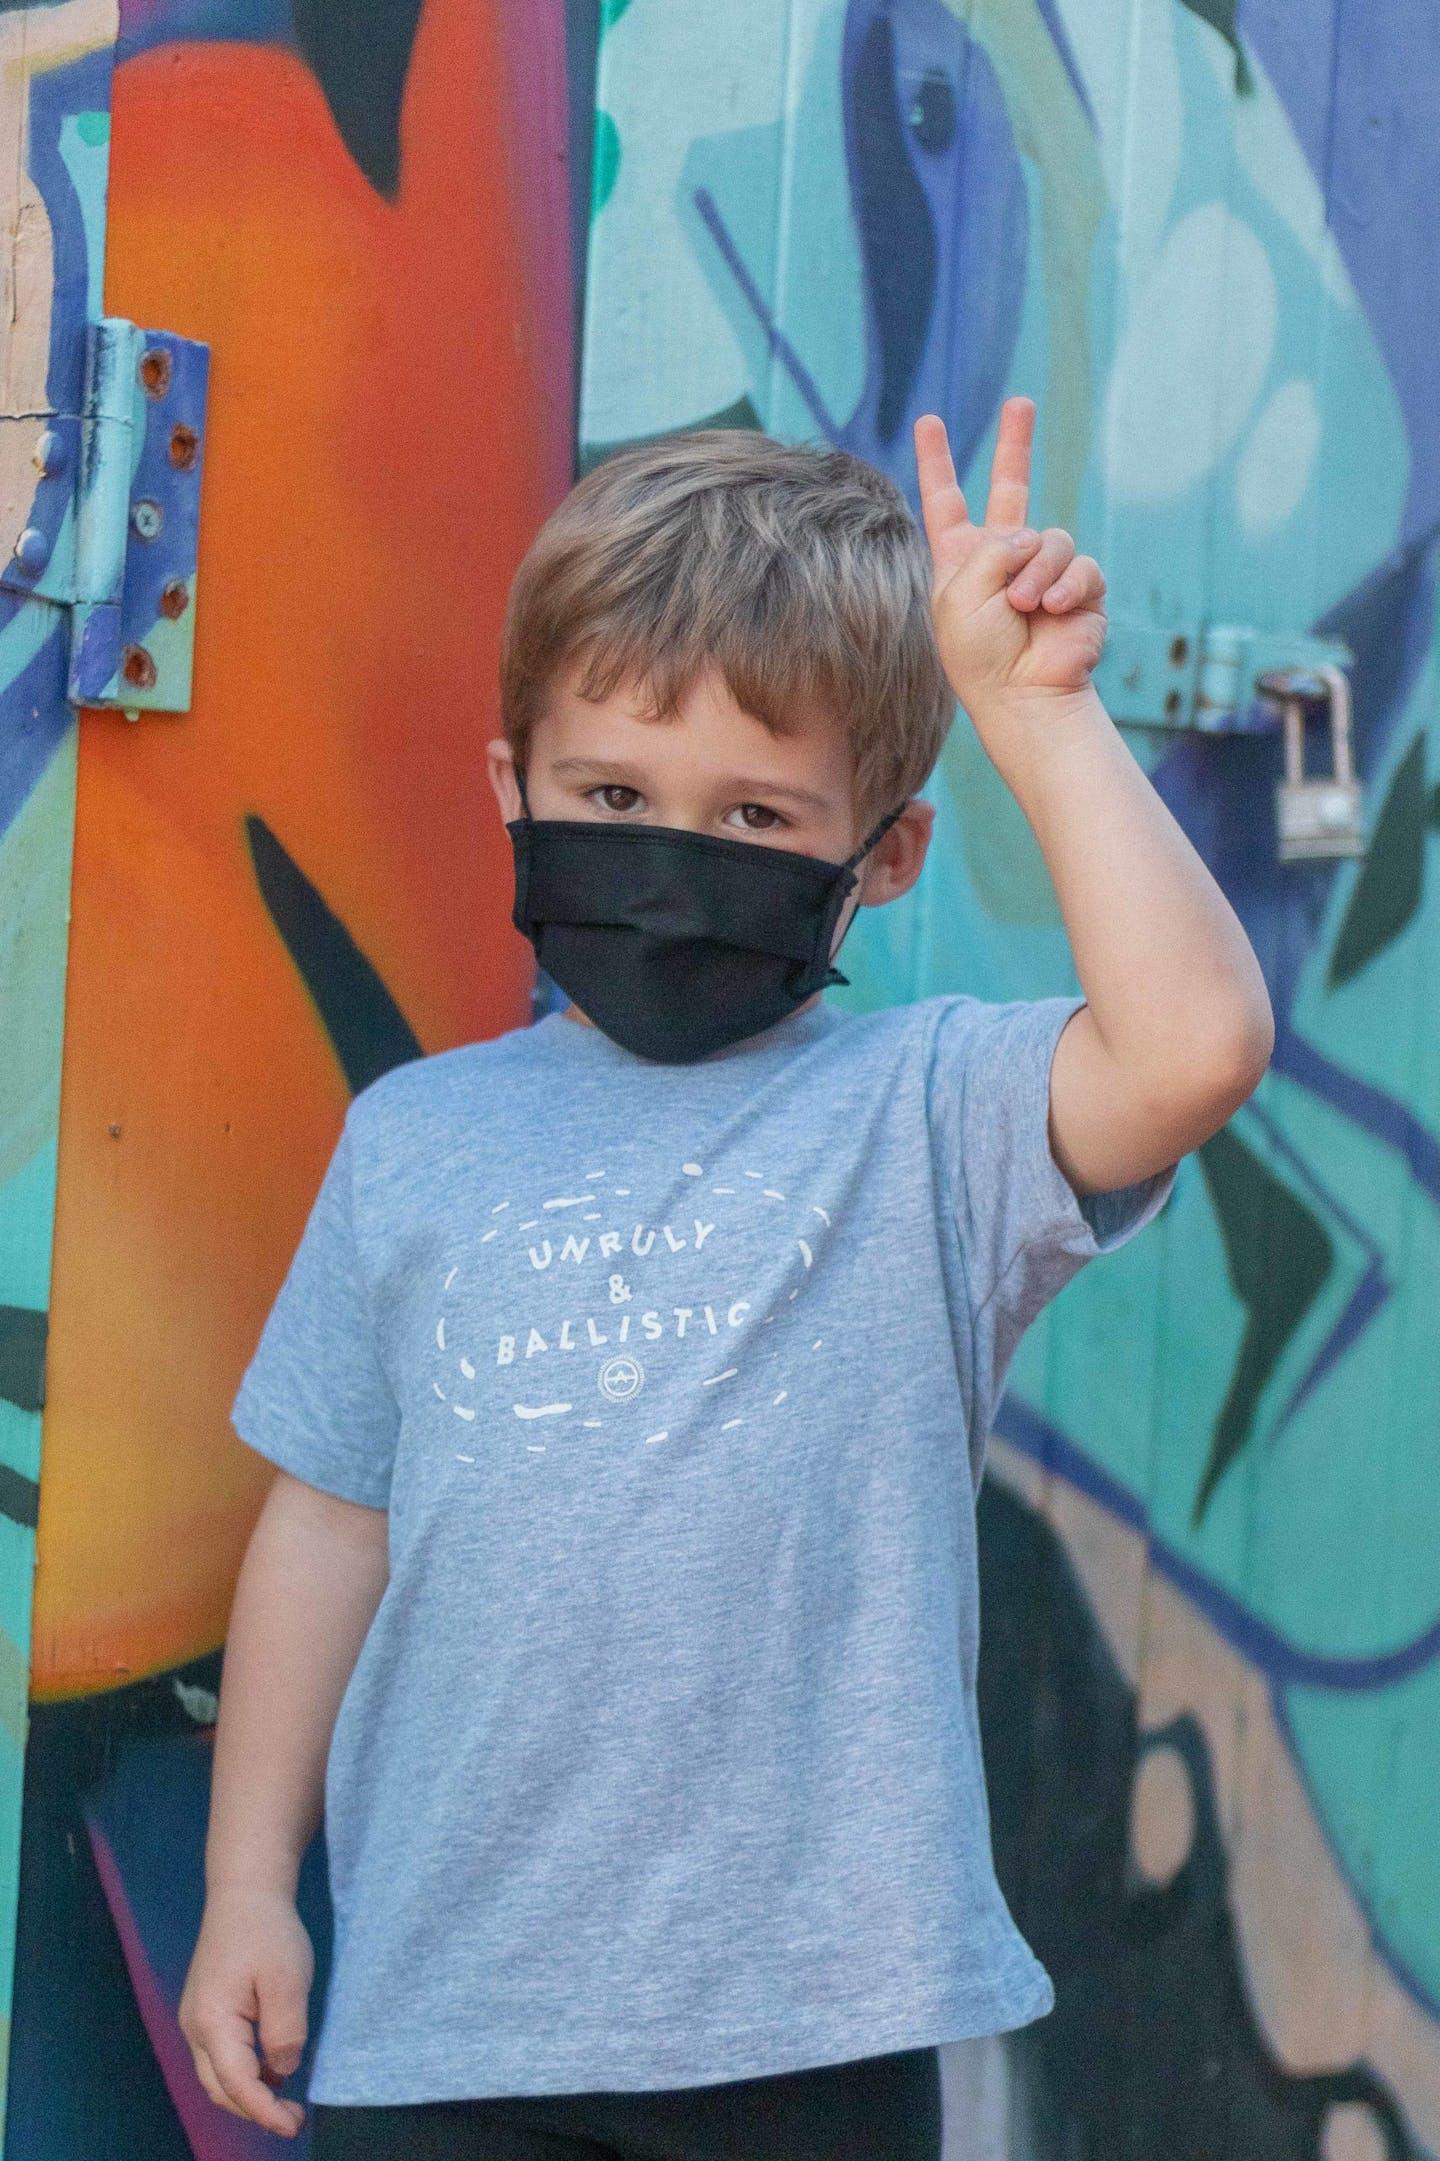 2020_Kids Shirt Inventory_ Carlos Maldonado Romero - 17